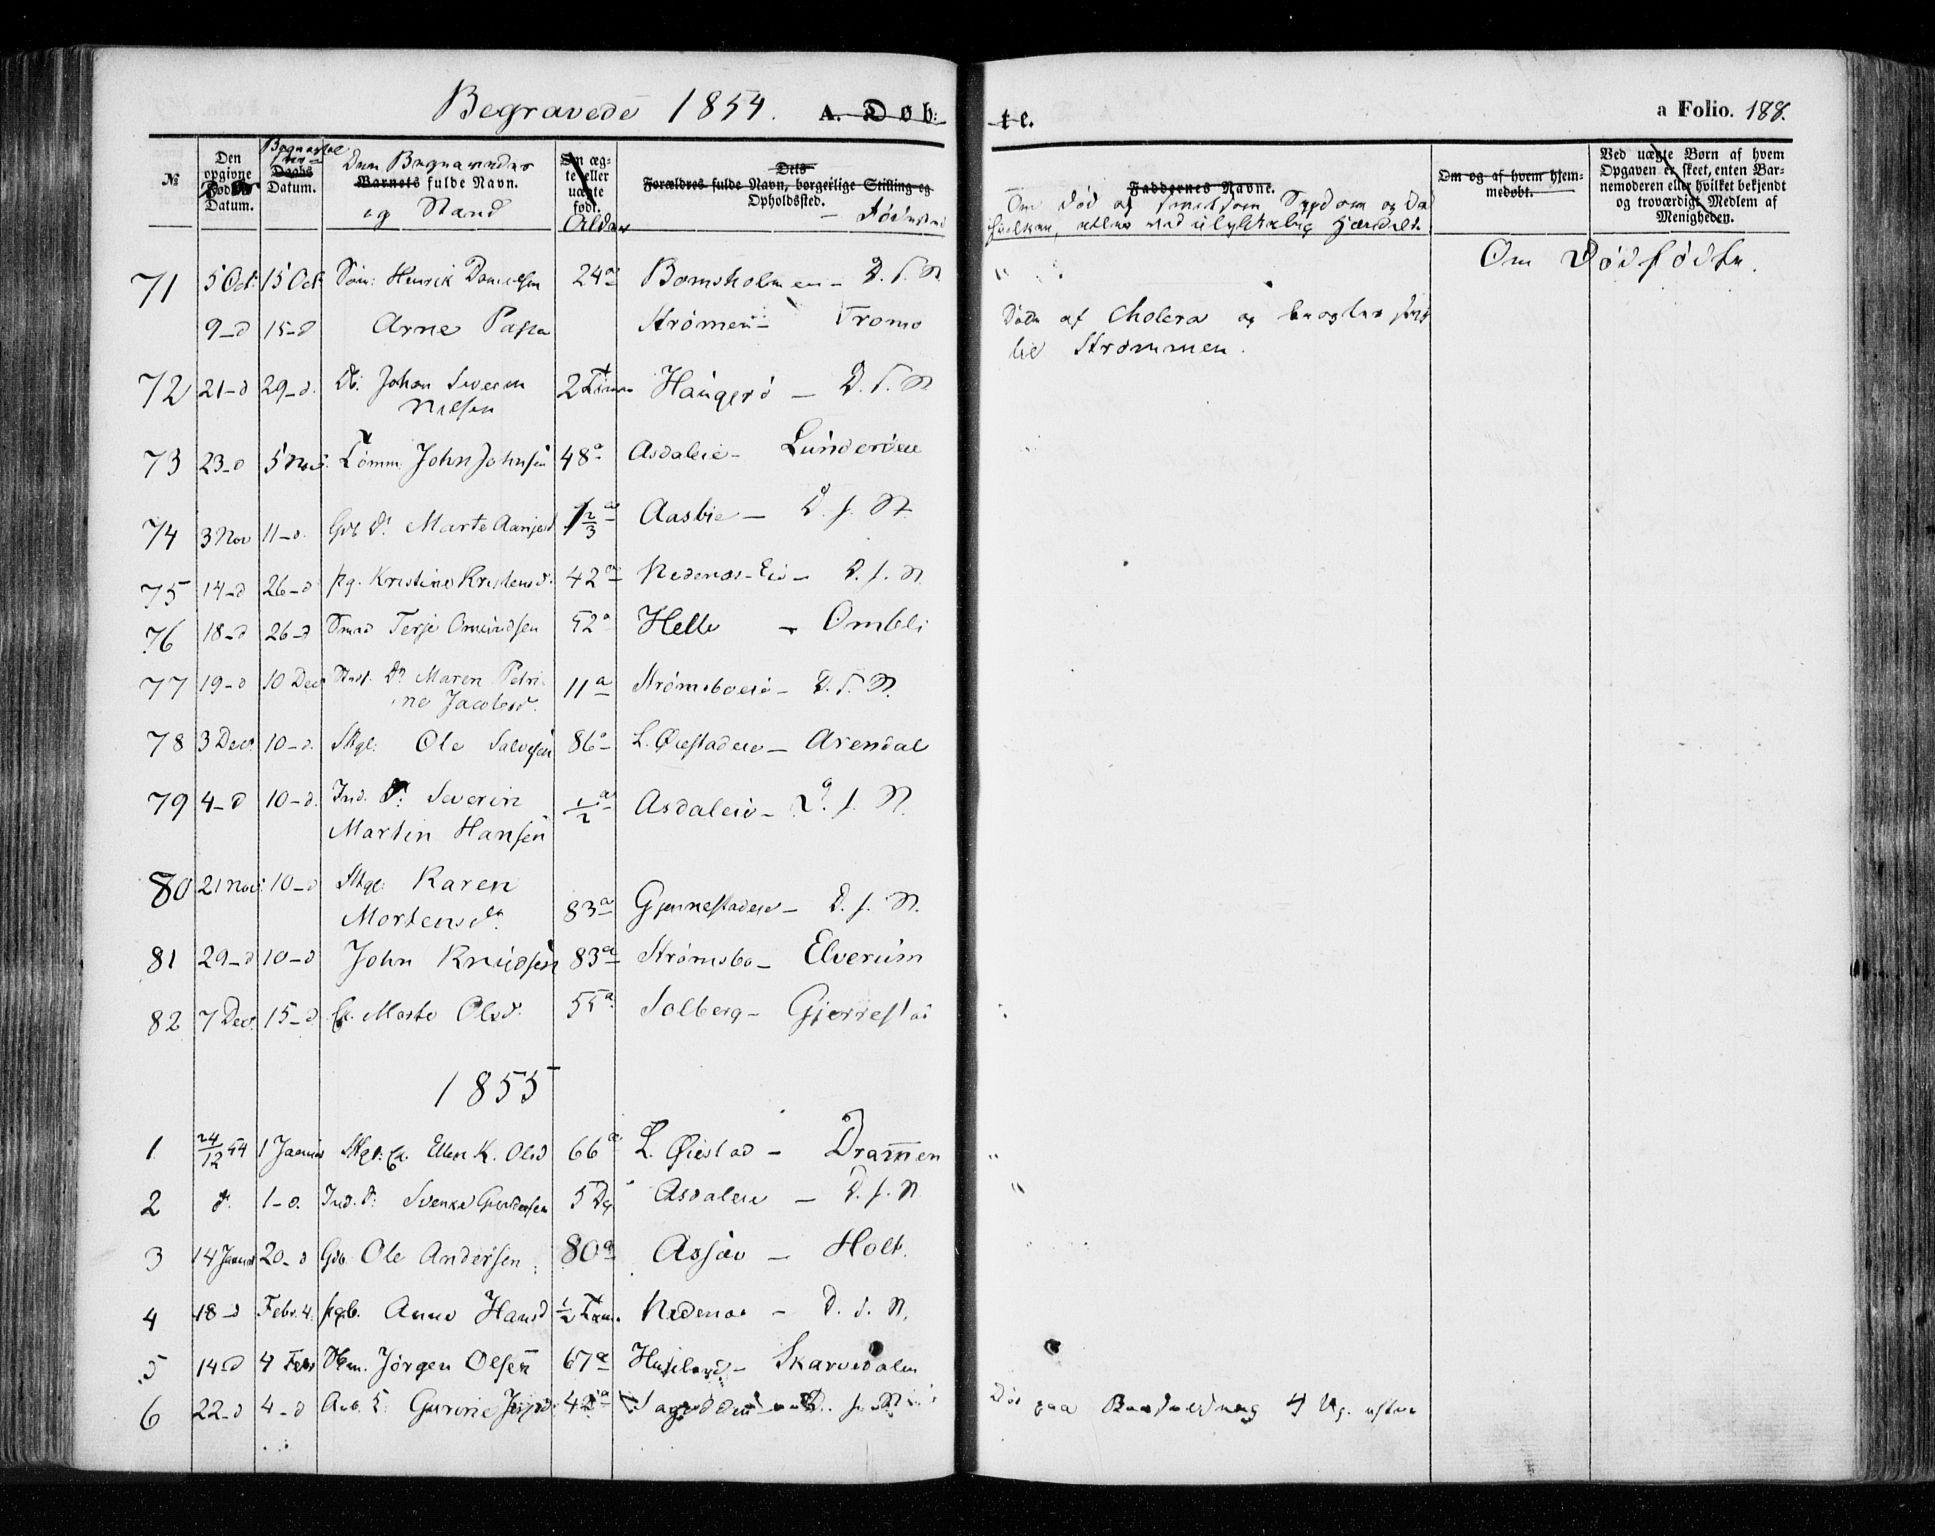 SAK, Øyestad sokneprestkontor, F/Fa/L0014: Ministerialbok nr. A 14, 1843-1856, s. 188